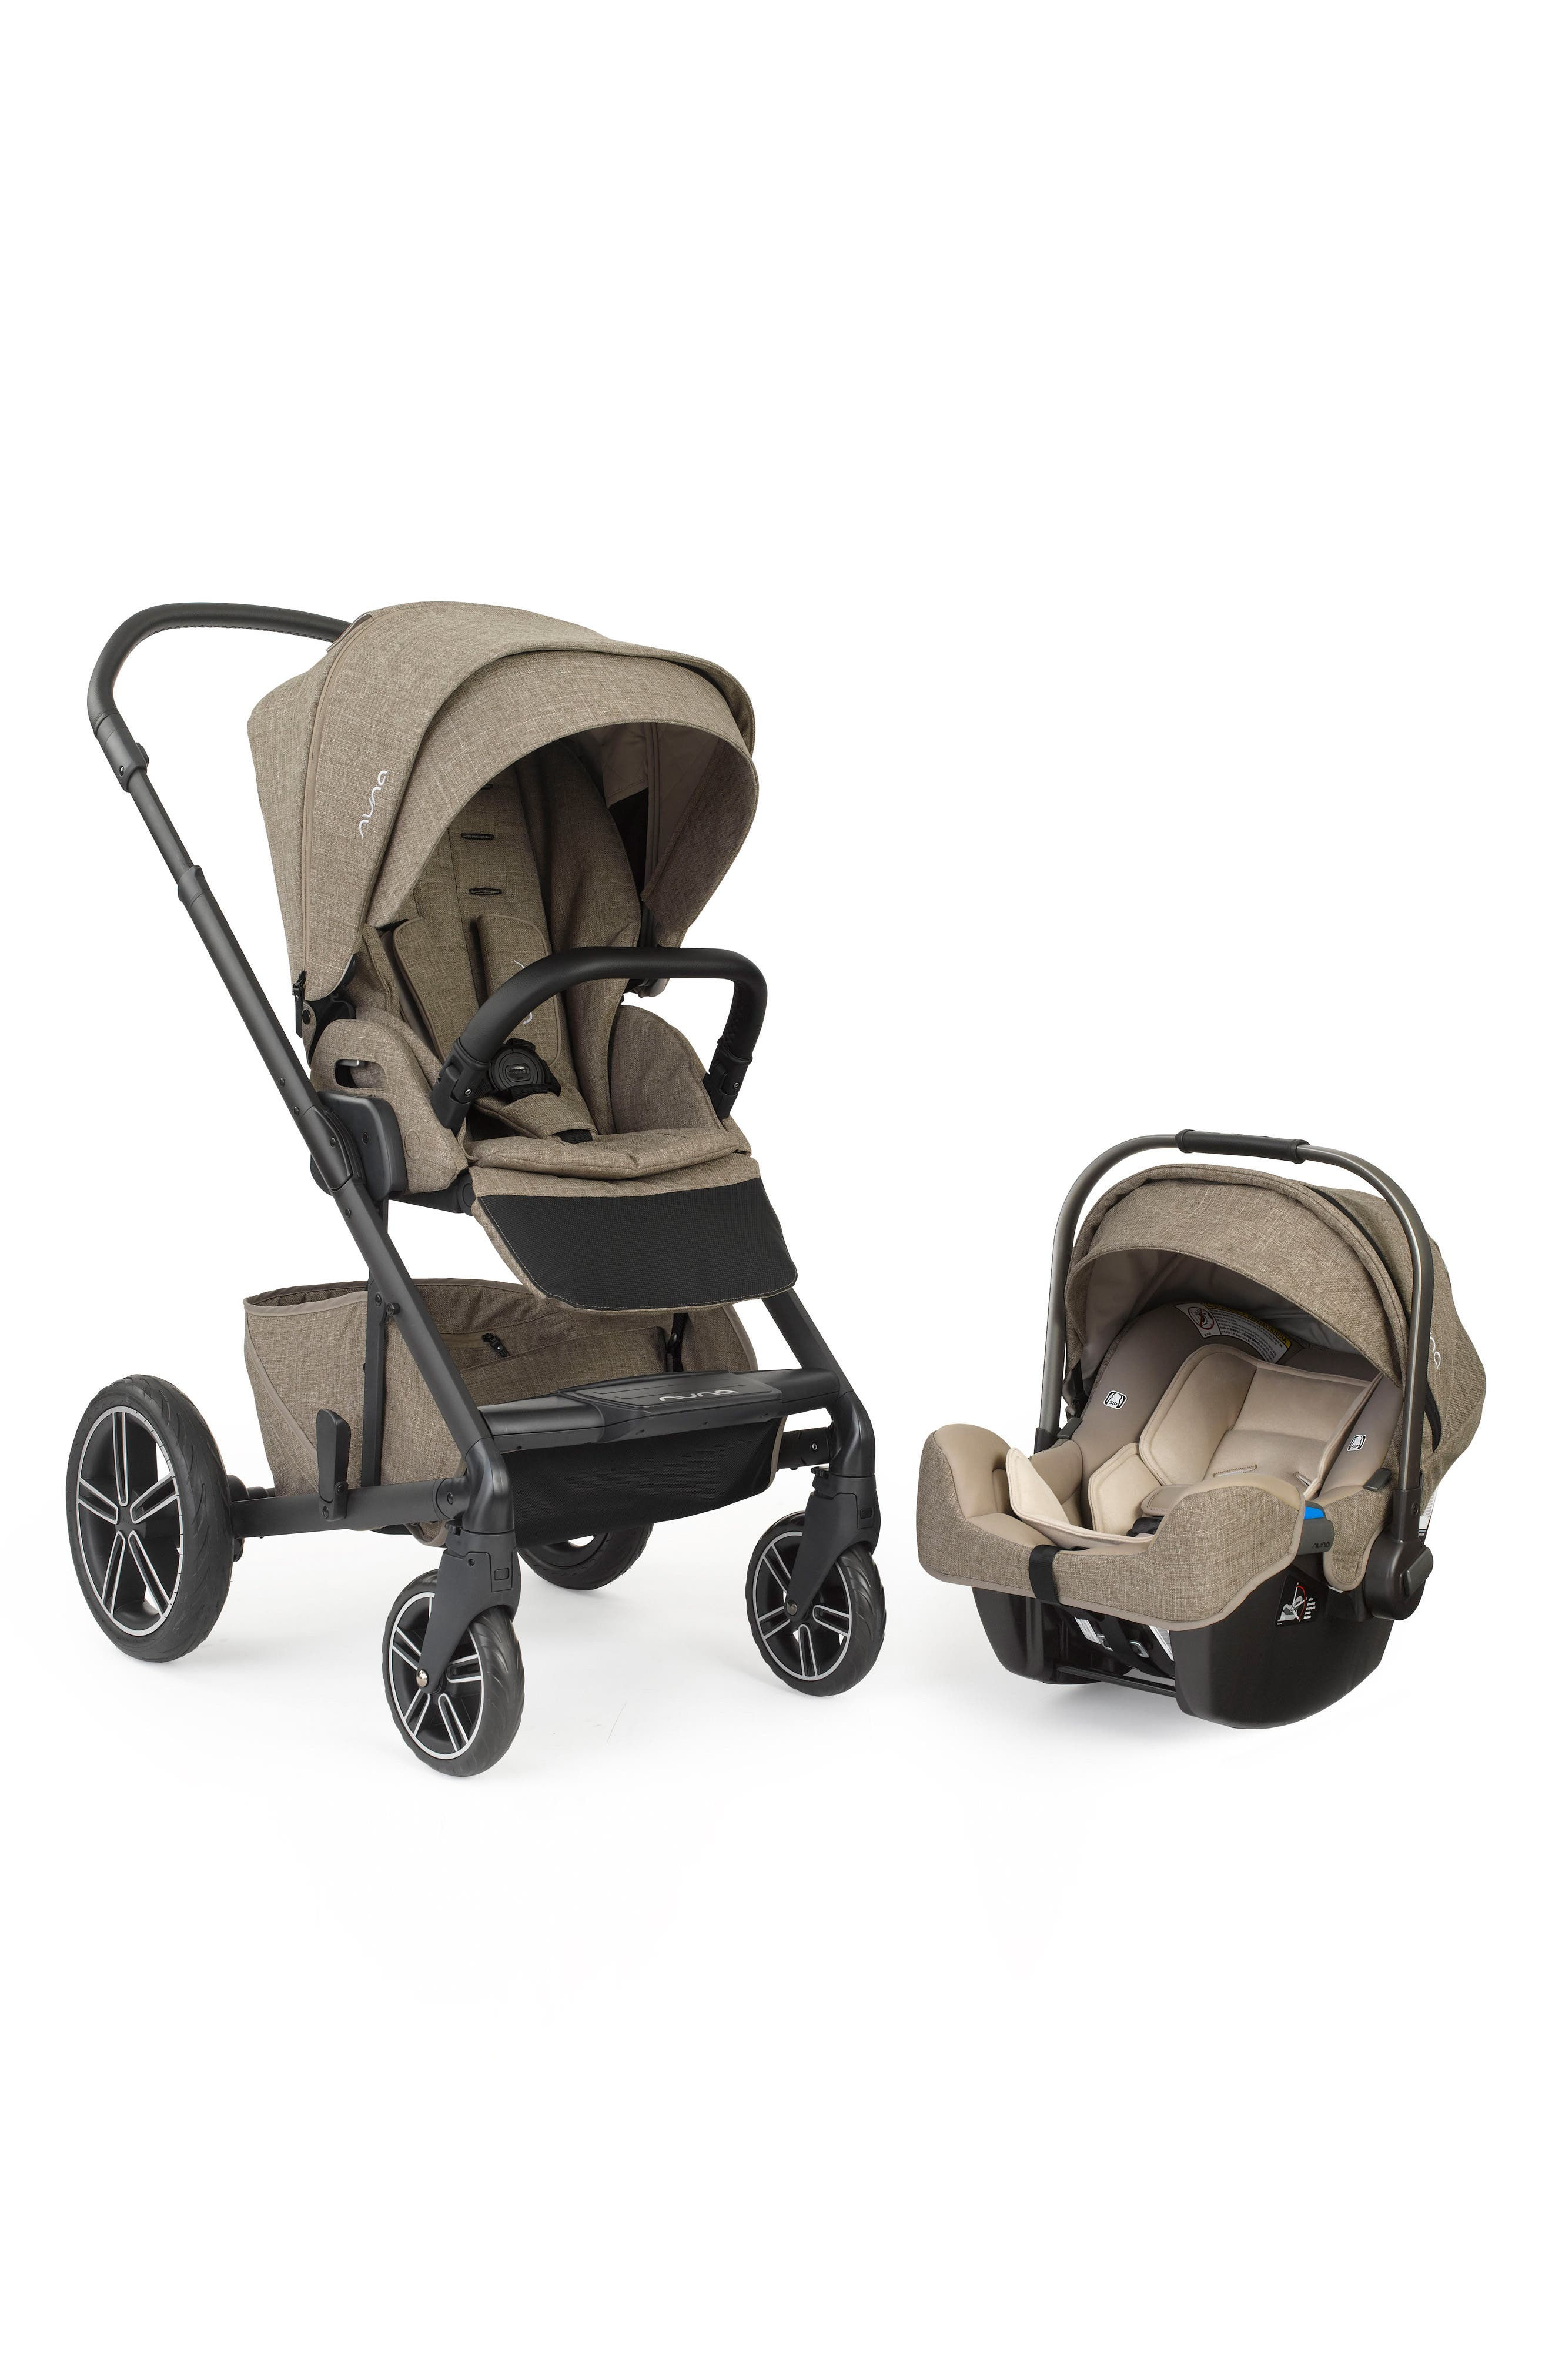 MIXX<sup>™</sup> 2 Stroller System & PIPA<sup>™</sup> Car Seat Set,                             Main thumbnail 2, color,